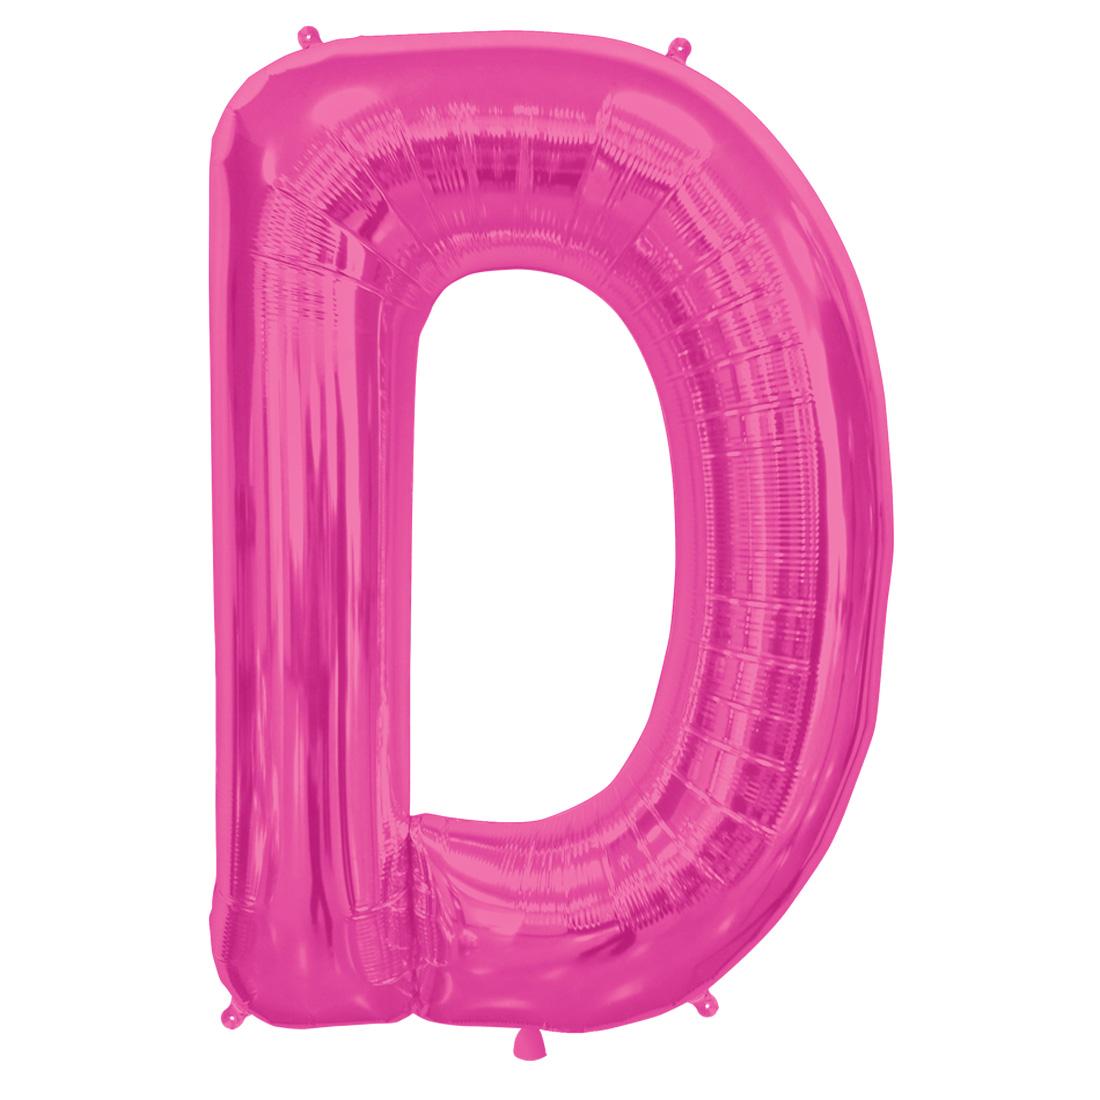 "Northstar Alphabet Letter D Shape Solid Jumbo Helium 34"" Foil Balloon, Magenta"